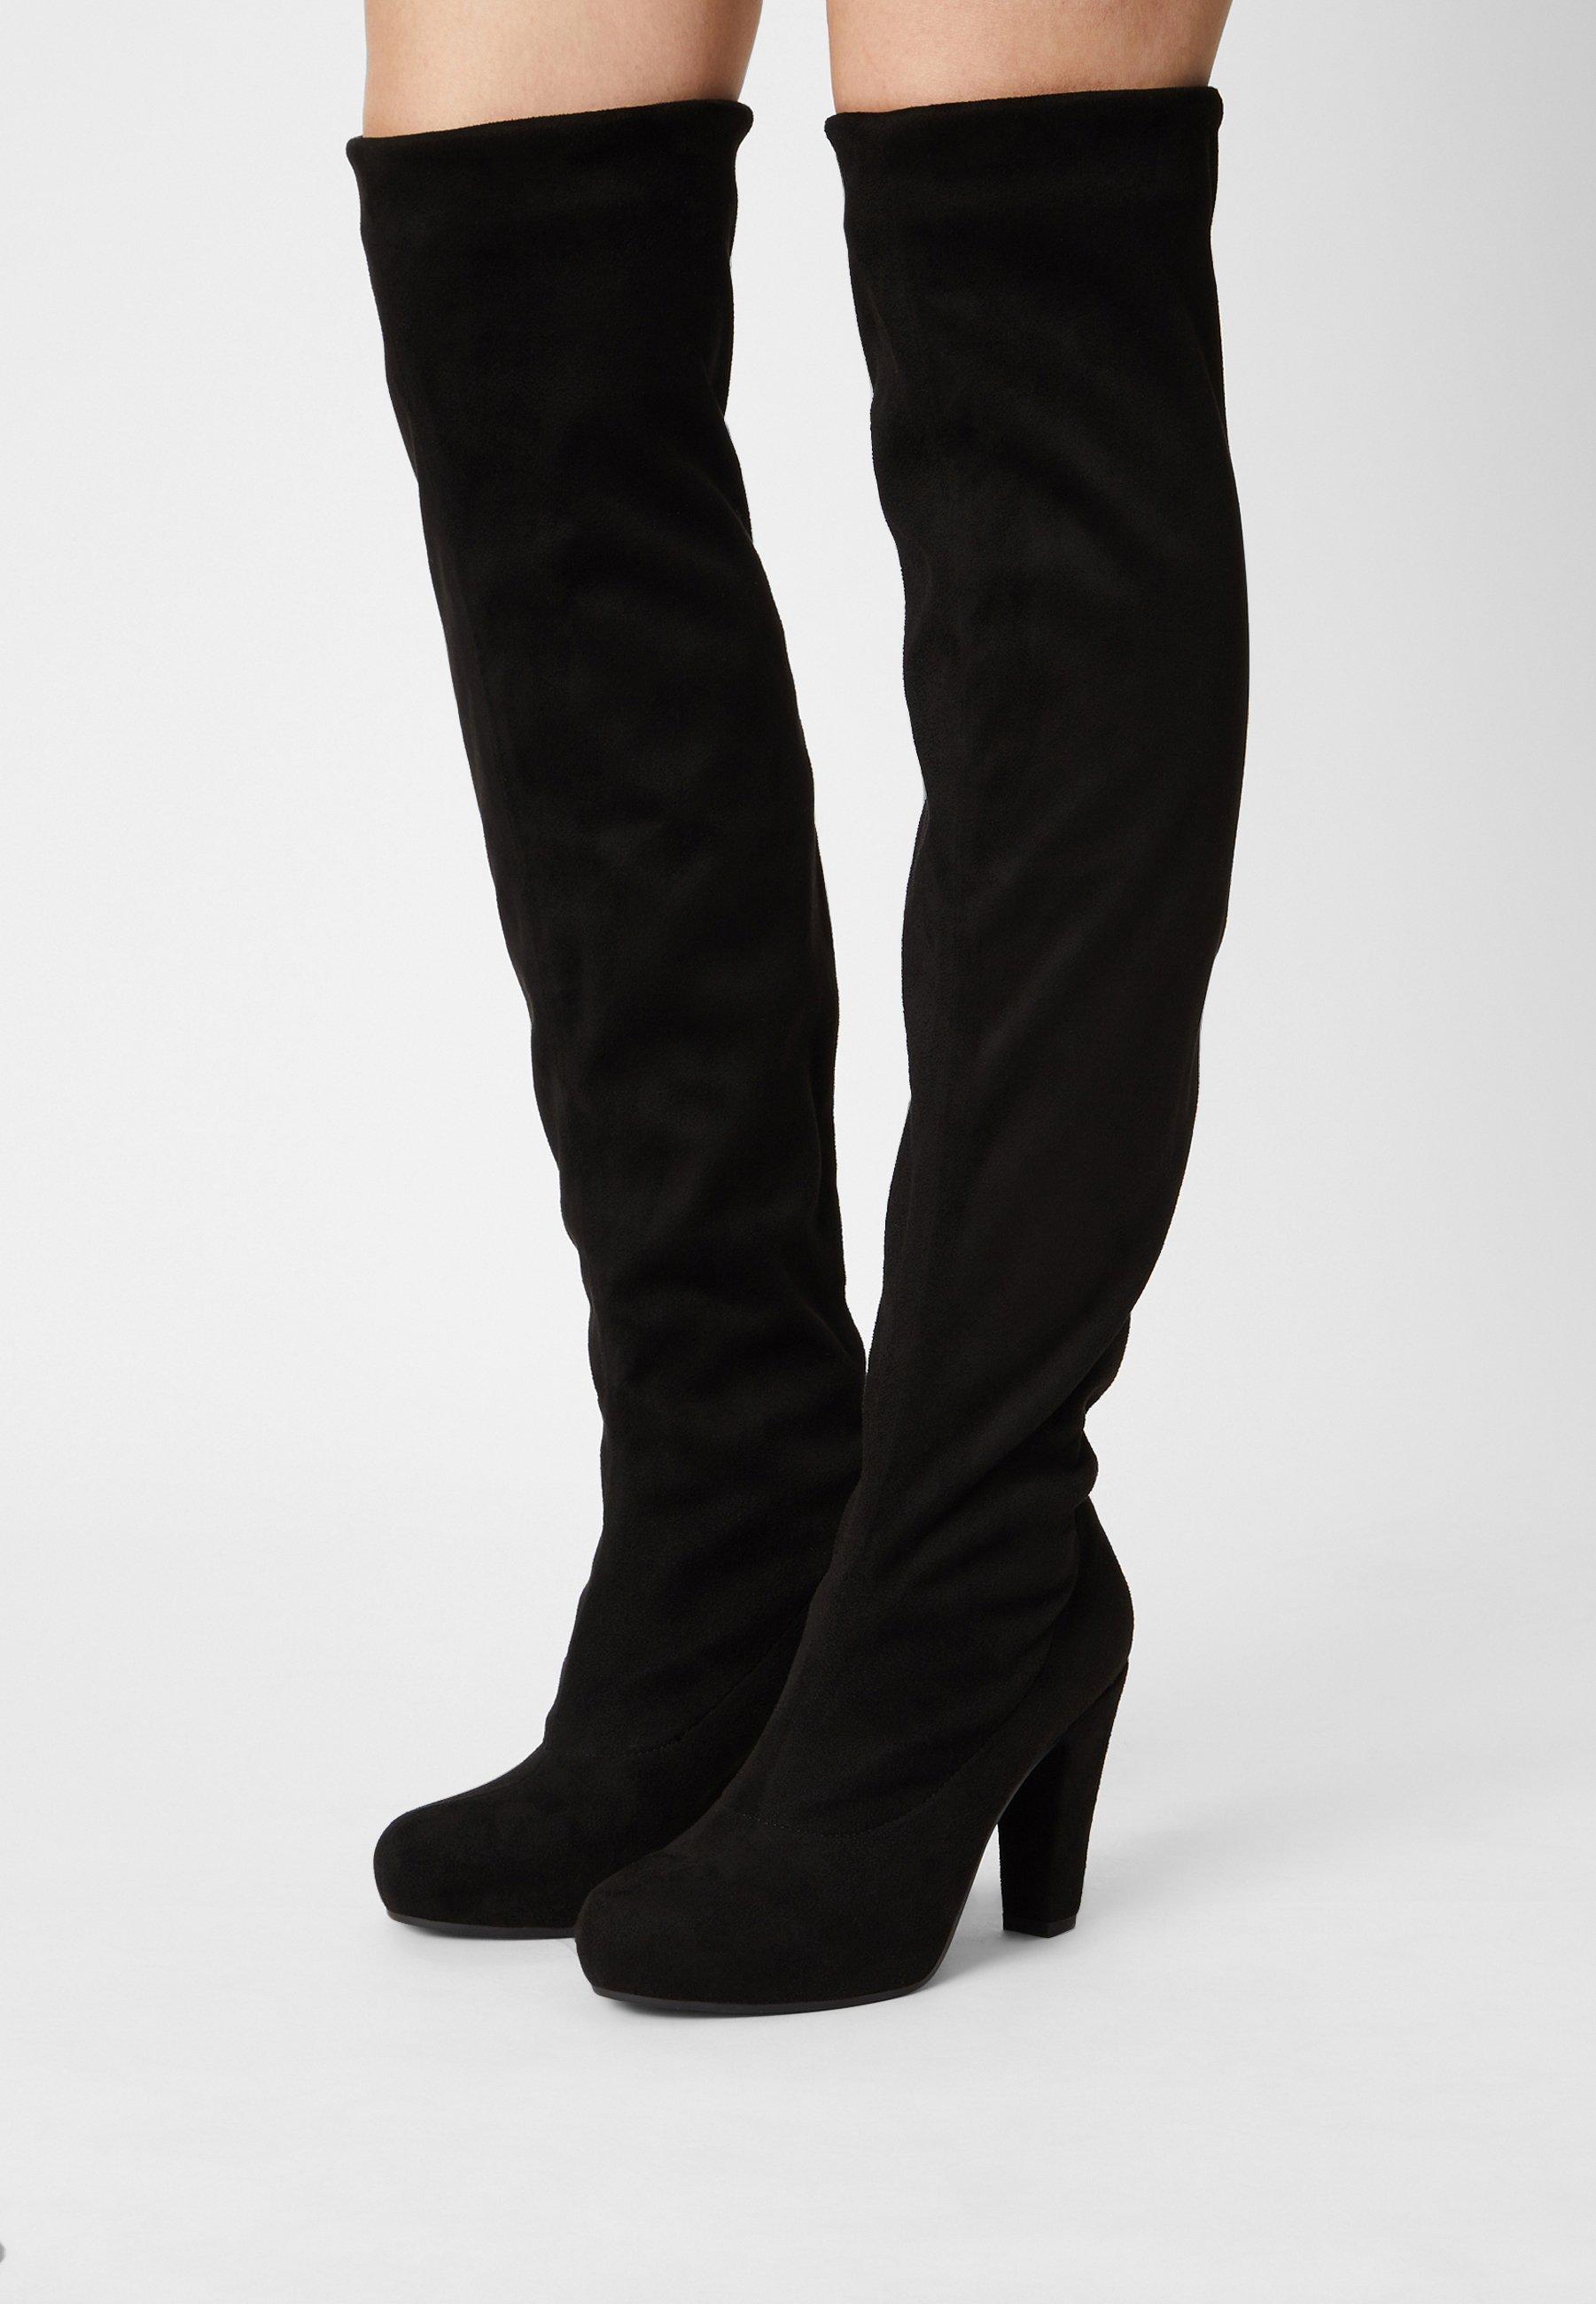 Damen High Heel Stiefel